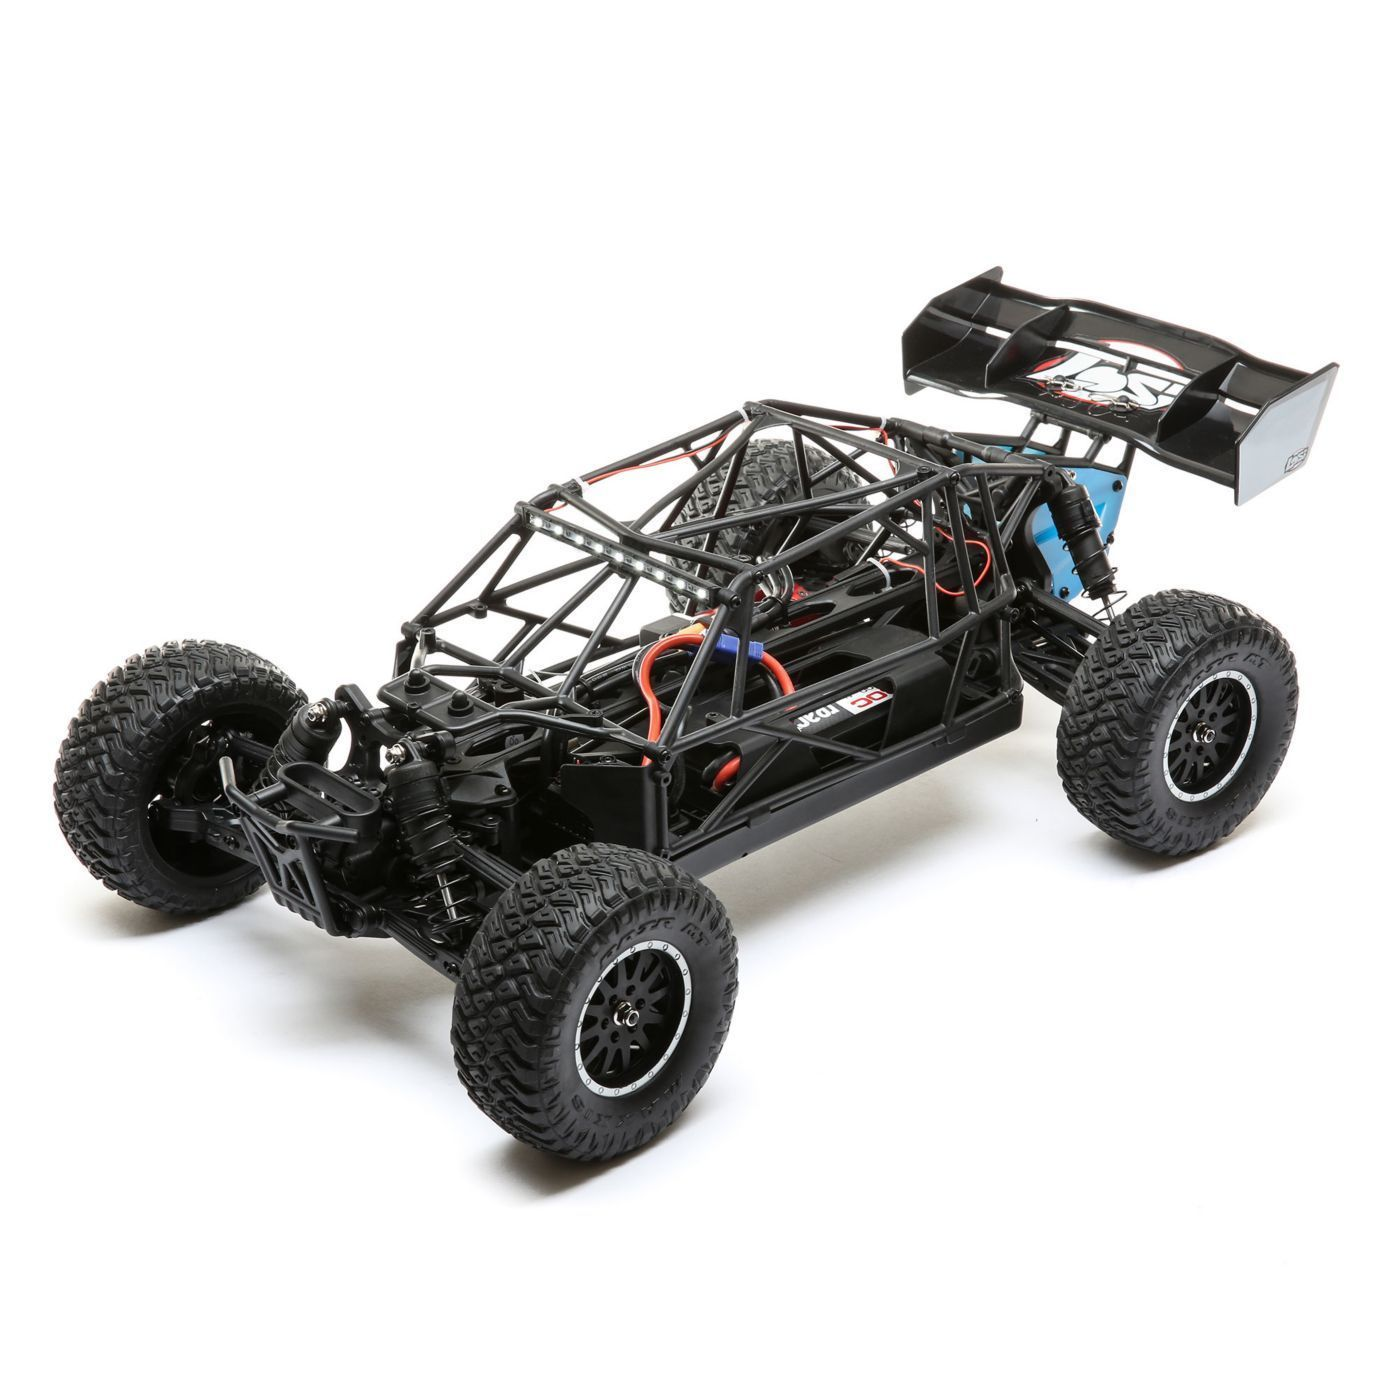 Losi 1/10 TENACITY-DB 4WD Radio Control and 50 similar items